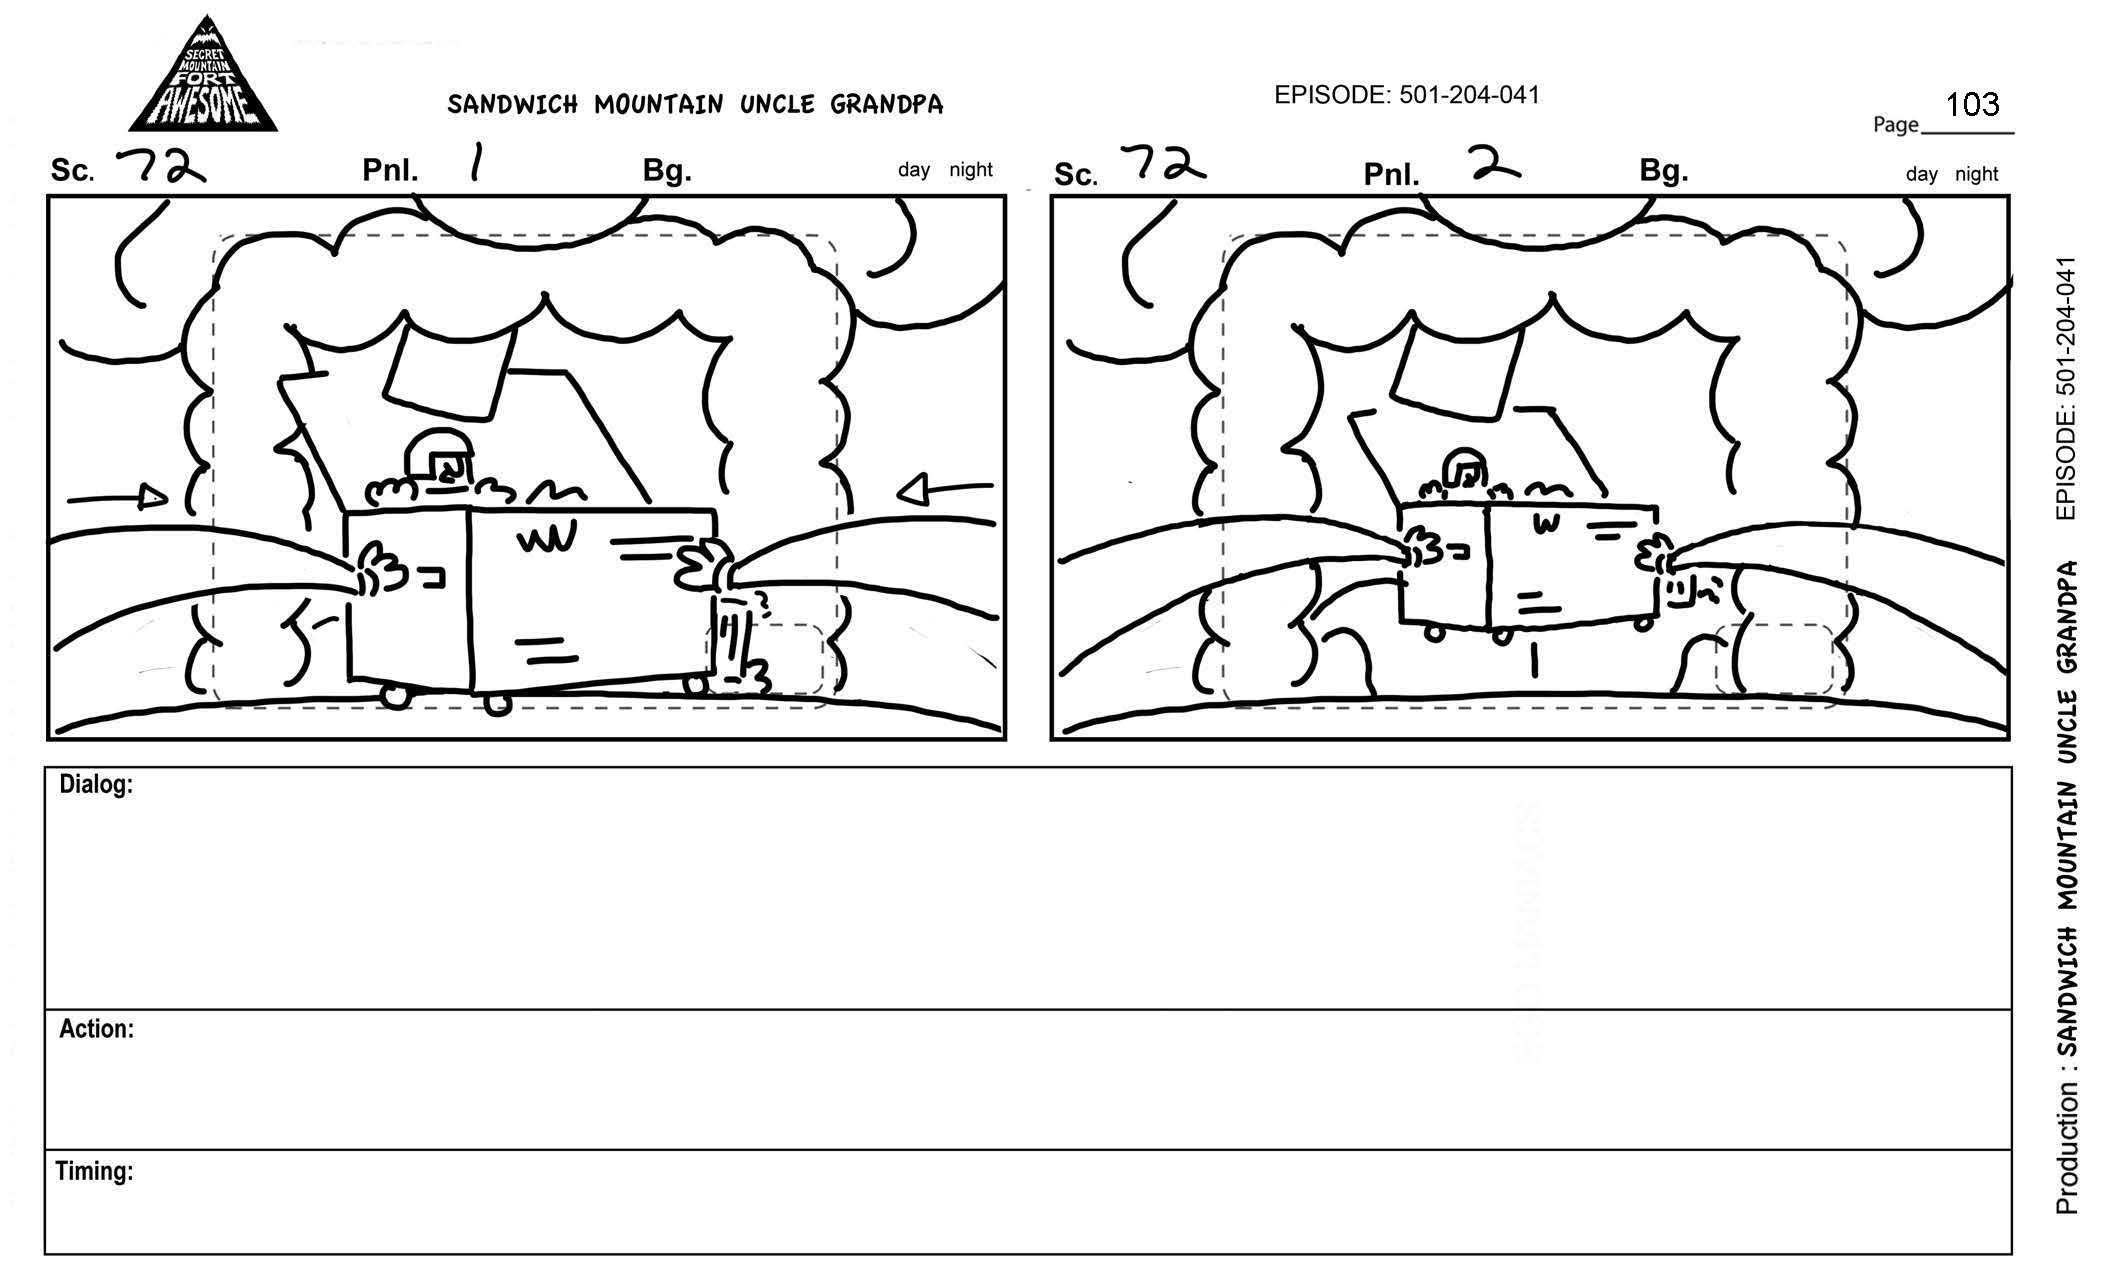 SMFA_SandwichMountainUncleGrandpa_Page_103.jpg